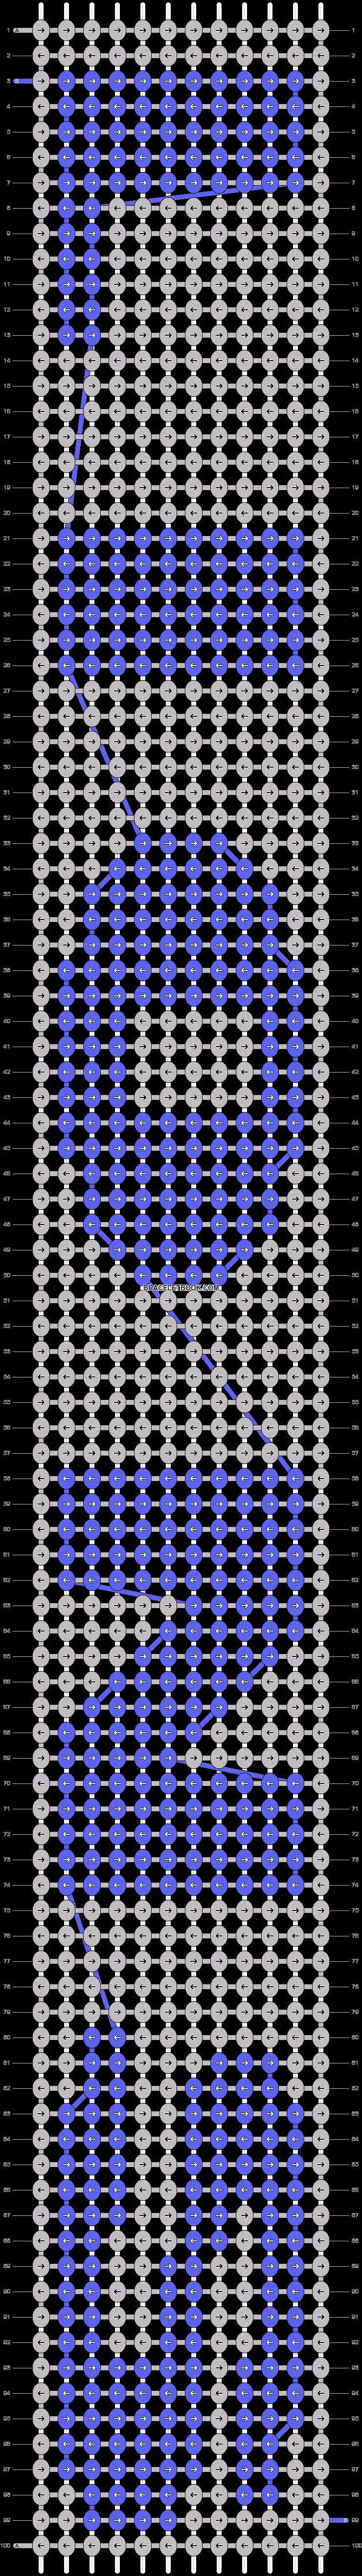 Alpha pattern #7878 pattern